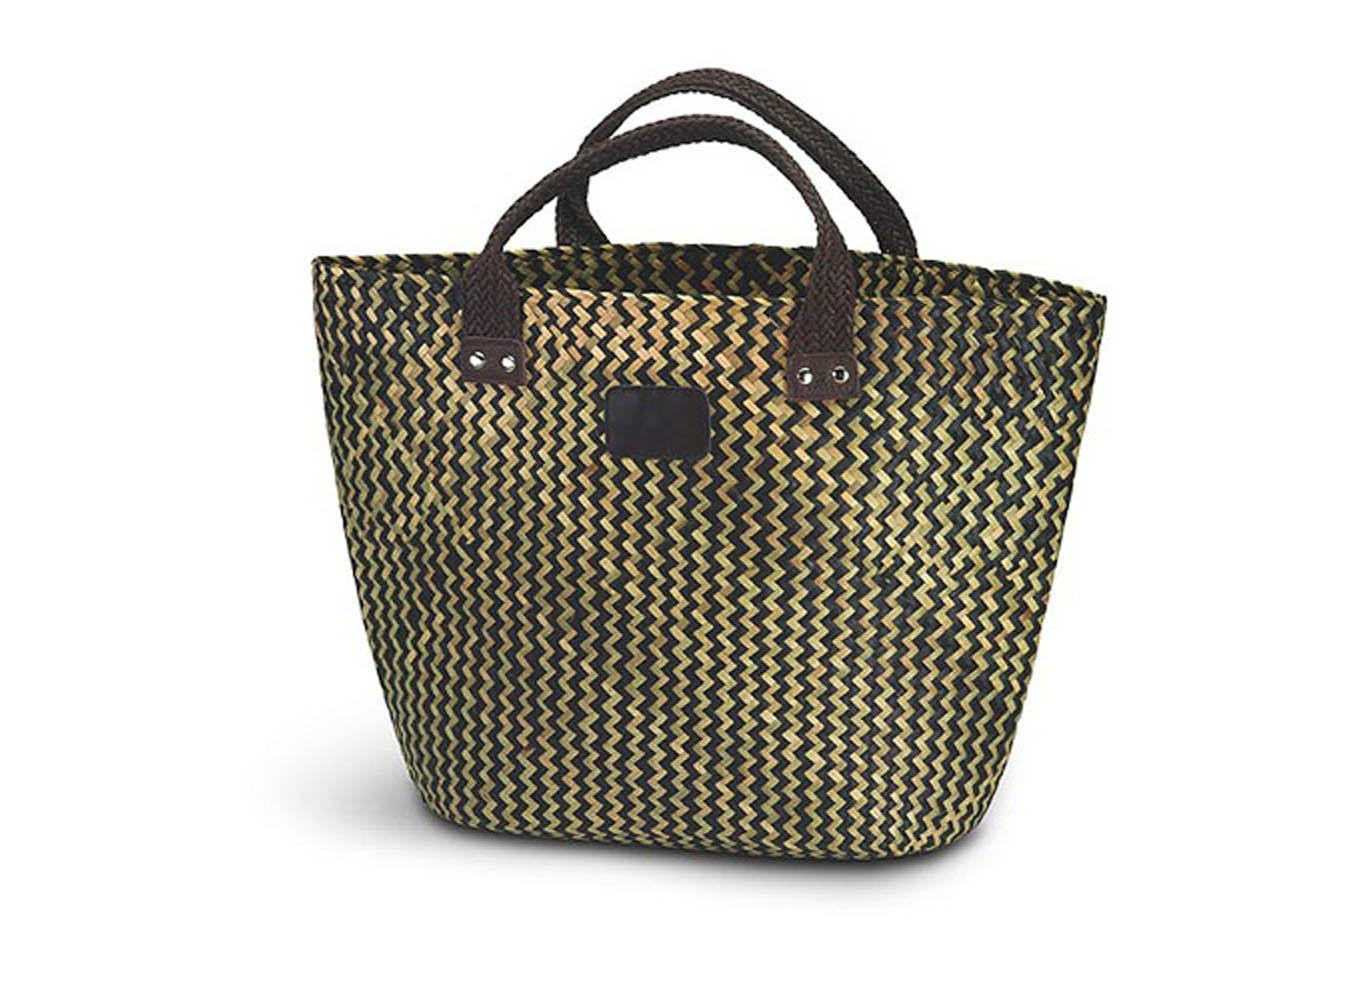 Custom 100% Straw Tote Bag